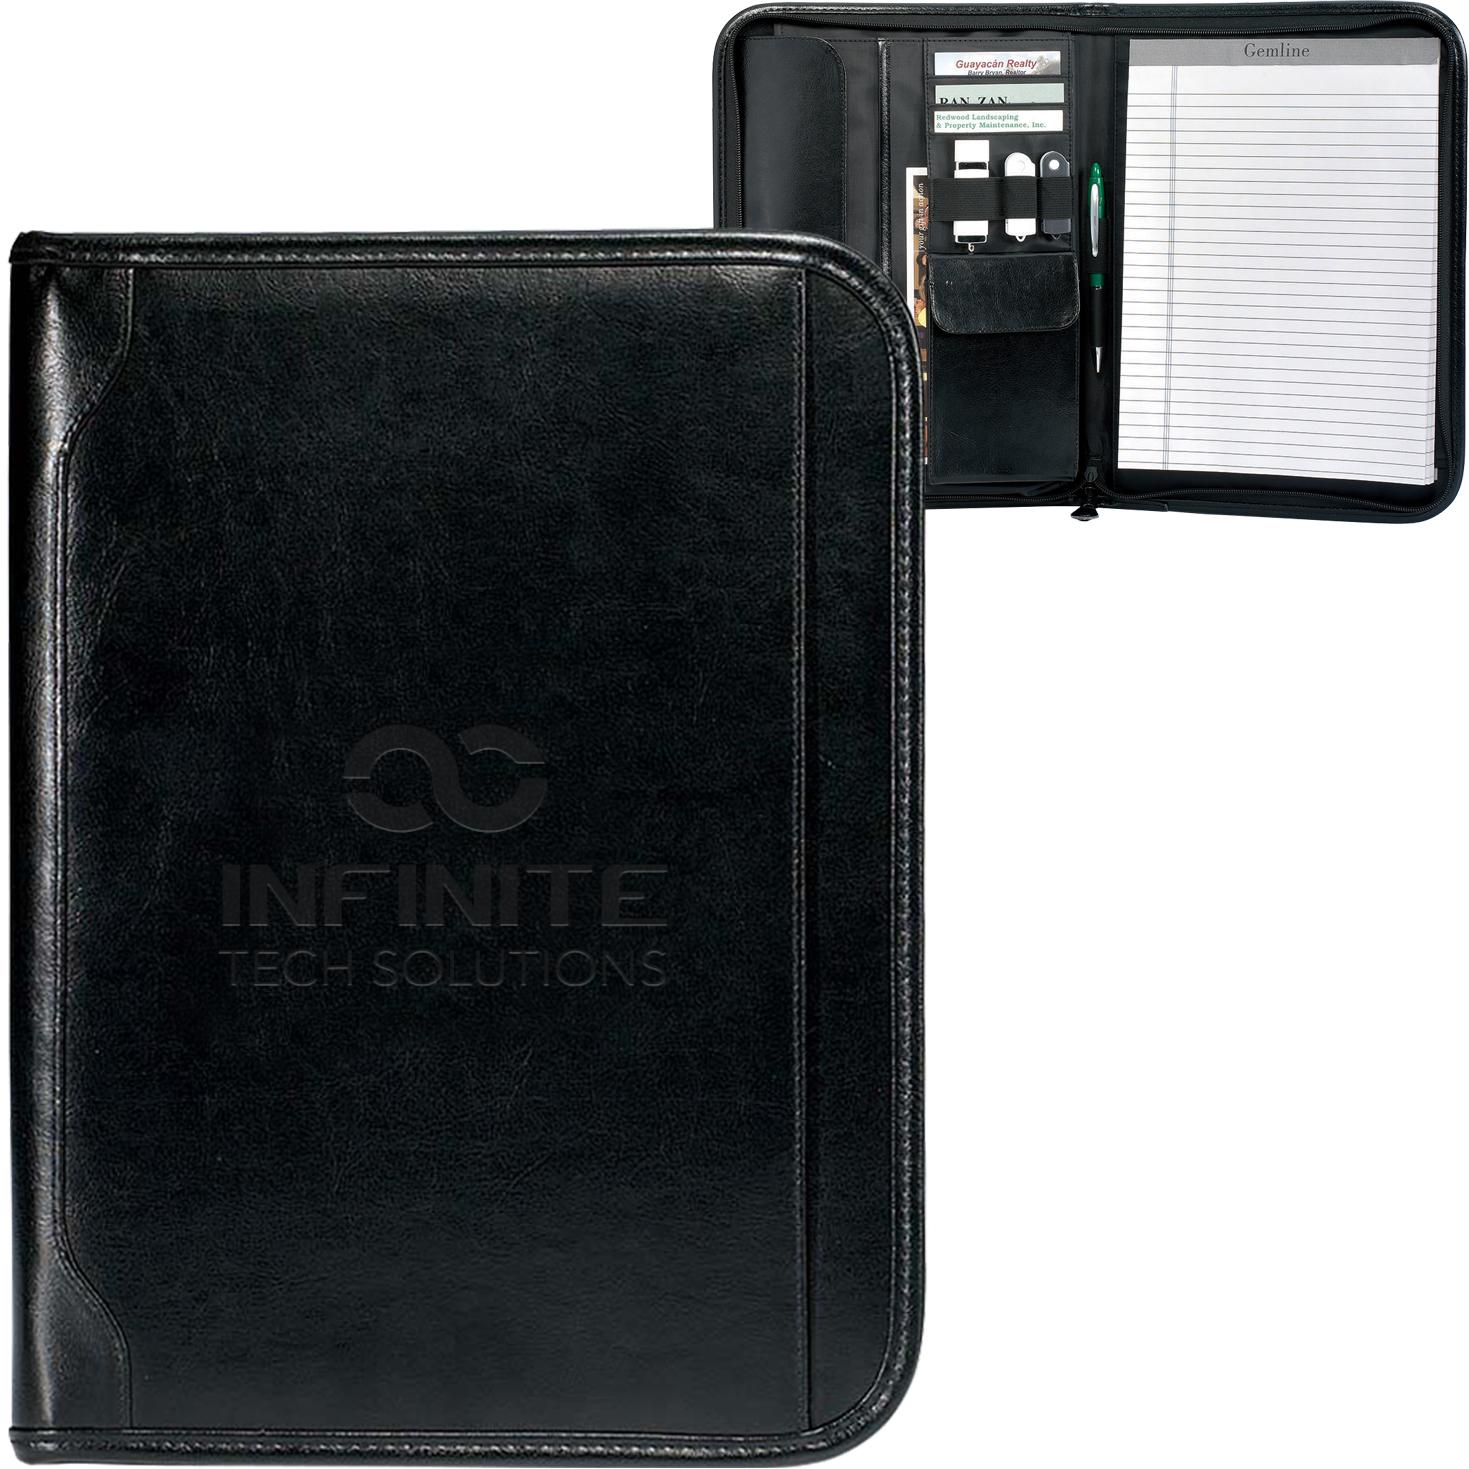 Vintage Leather E-Padfolio, iPad Compatible